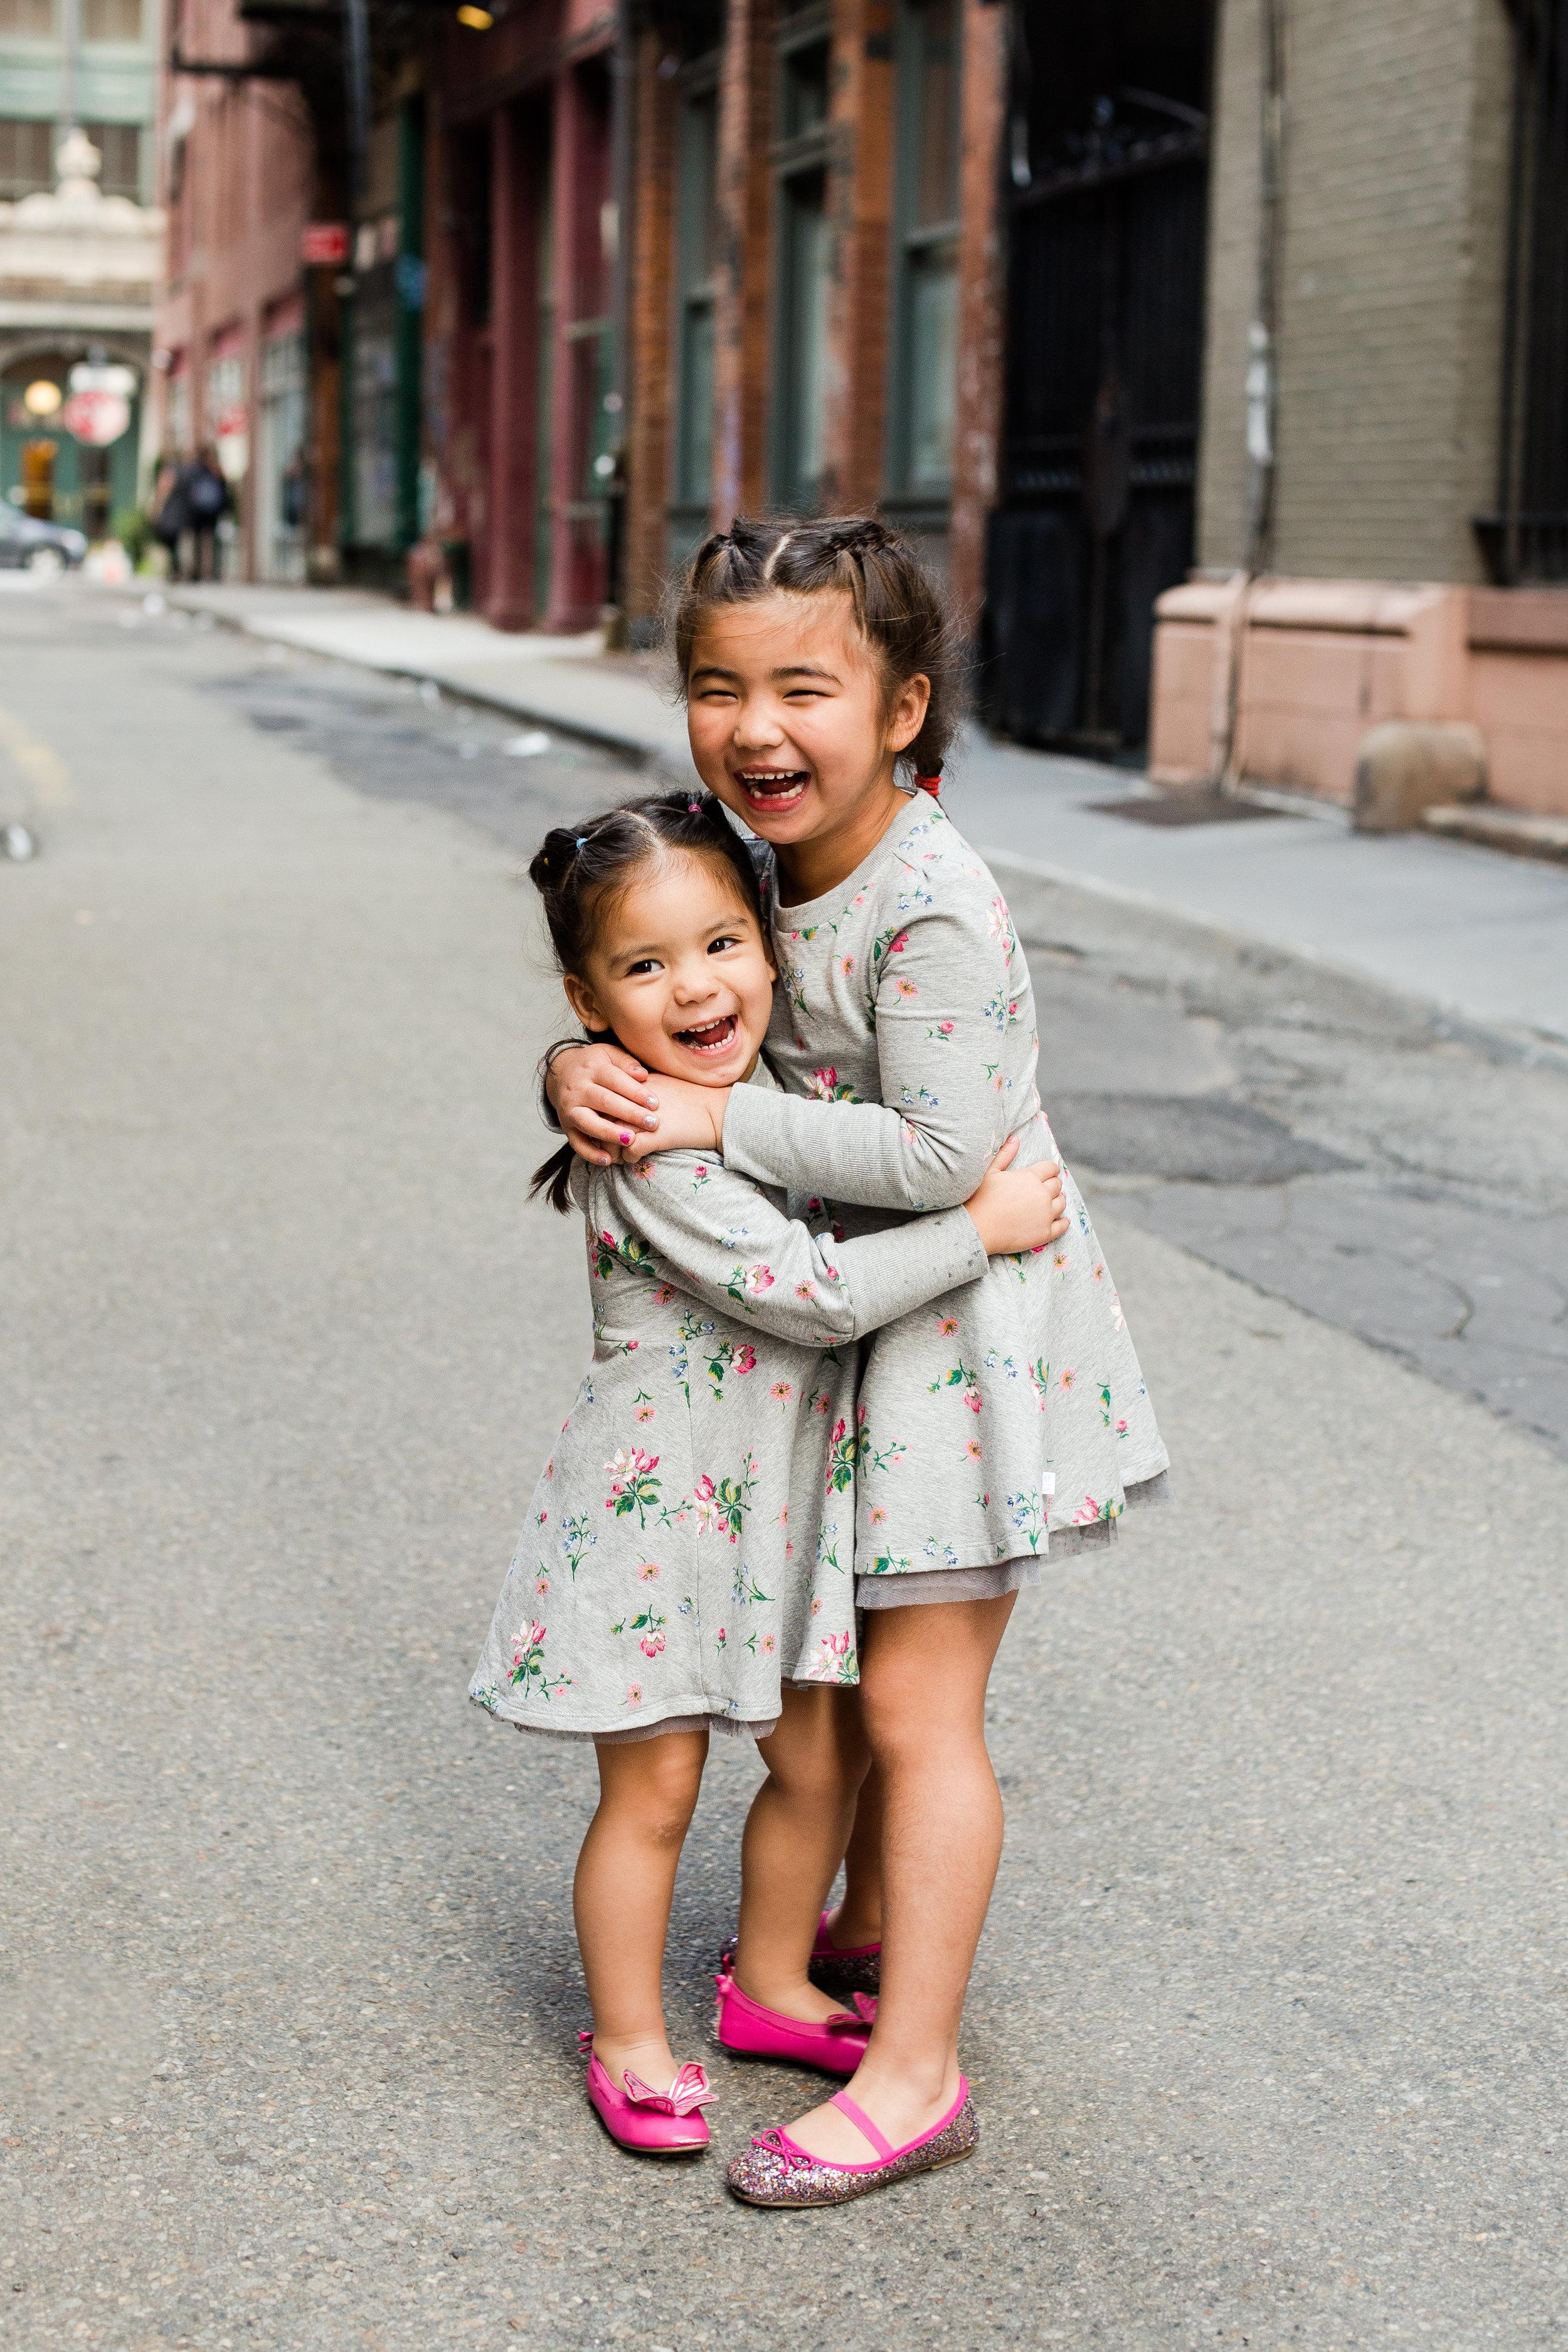 lissiephoto_loomis_nyc_family_photography56.JPG